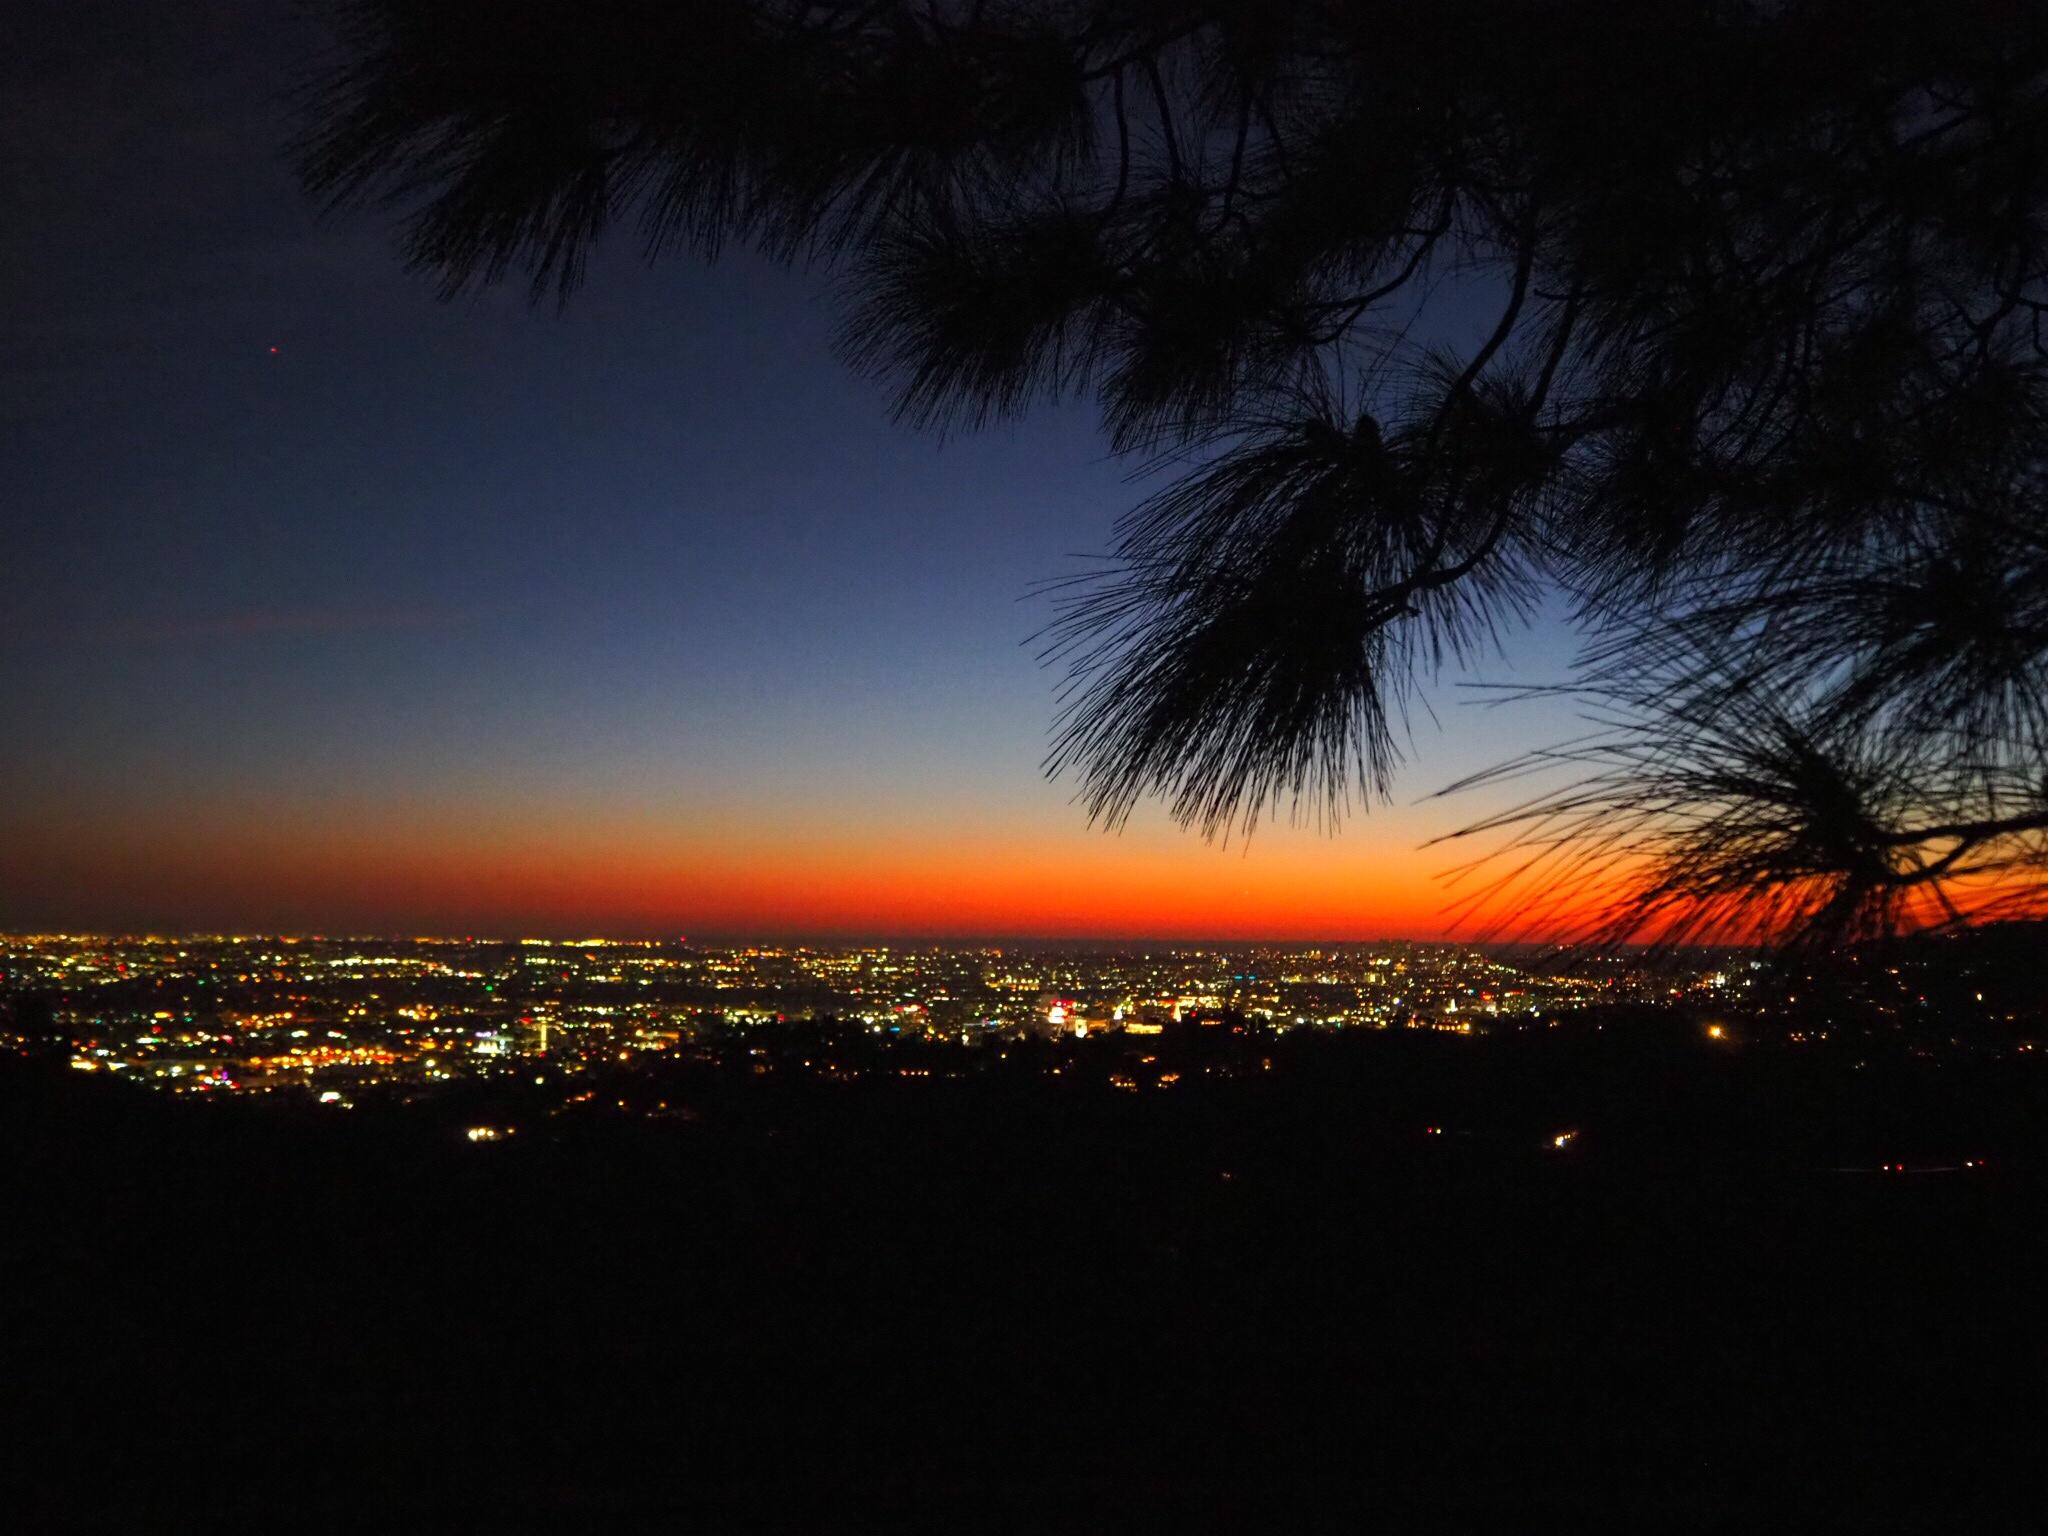 img 2384 - 24hours in LA - ロサンゼルスで過ごした24時間